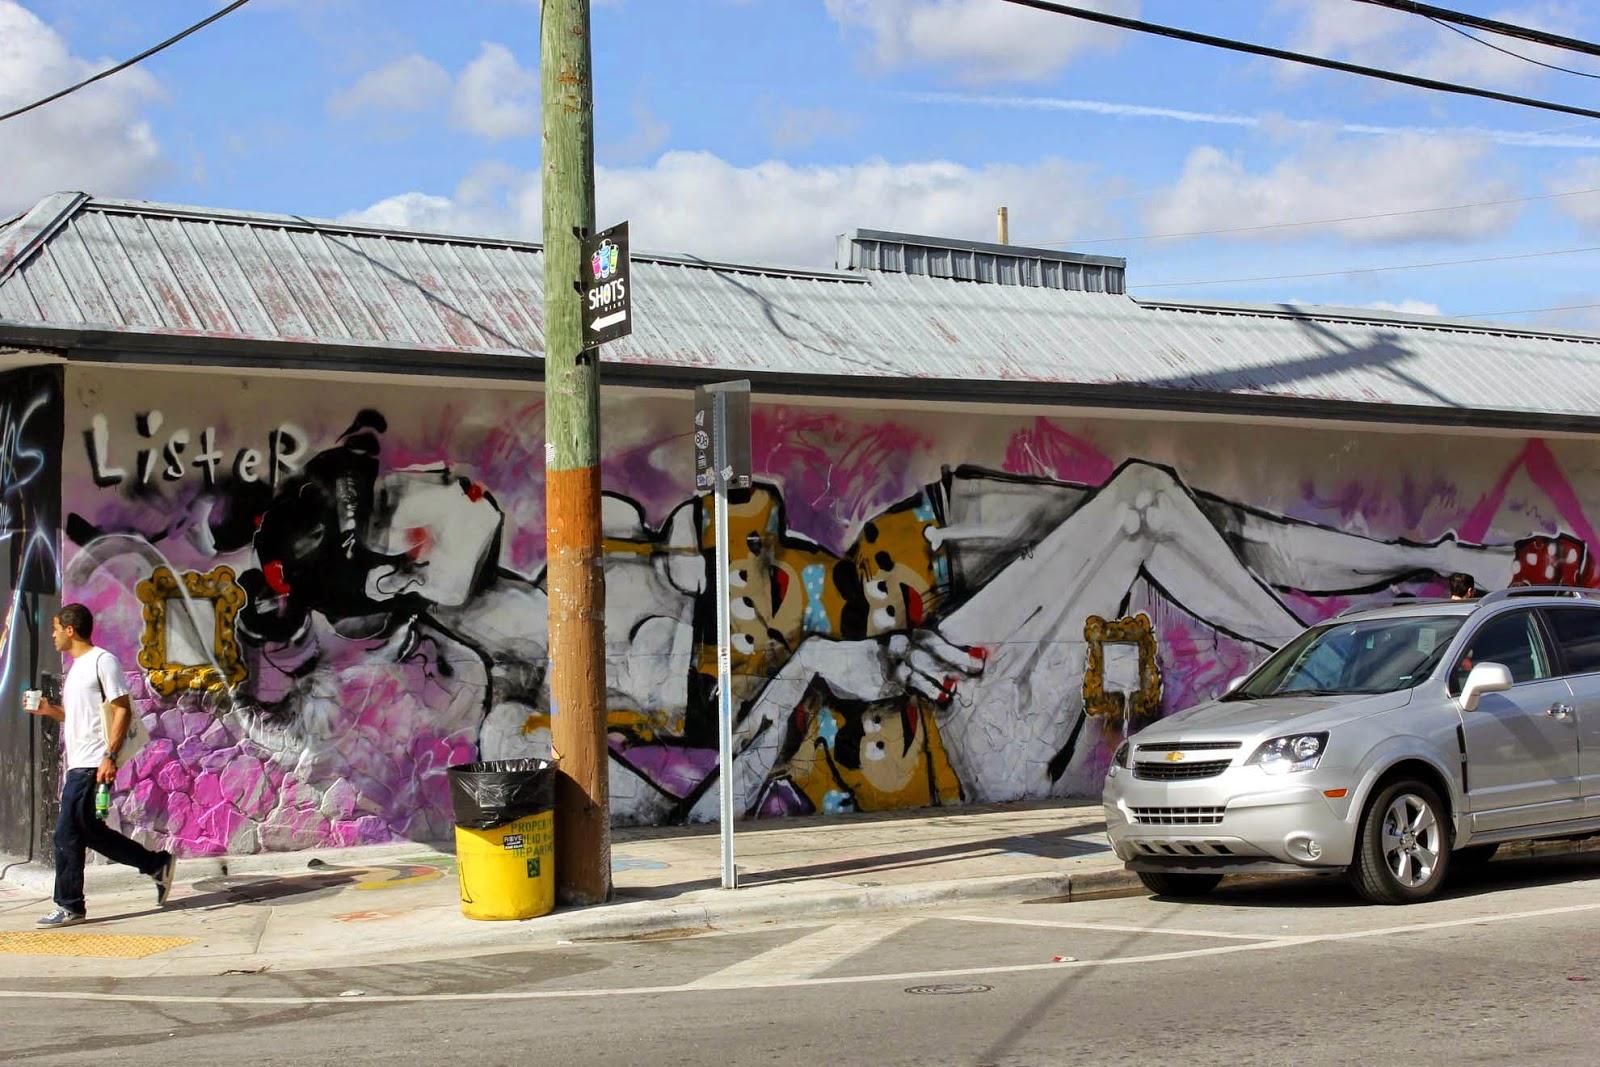 anthony-lister-new-mural-at-art-basel-2014-01